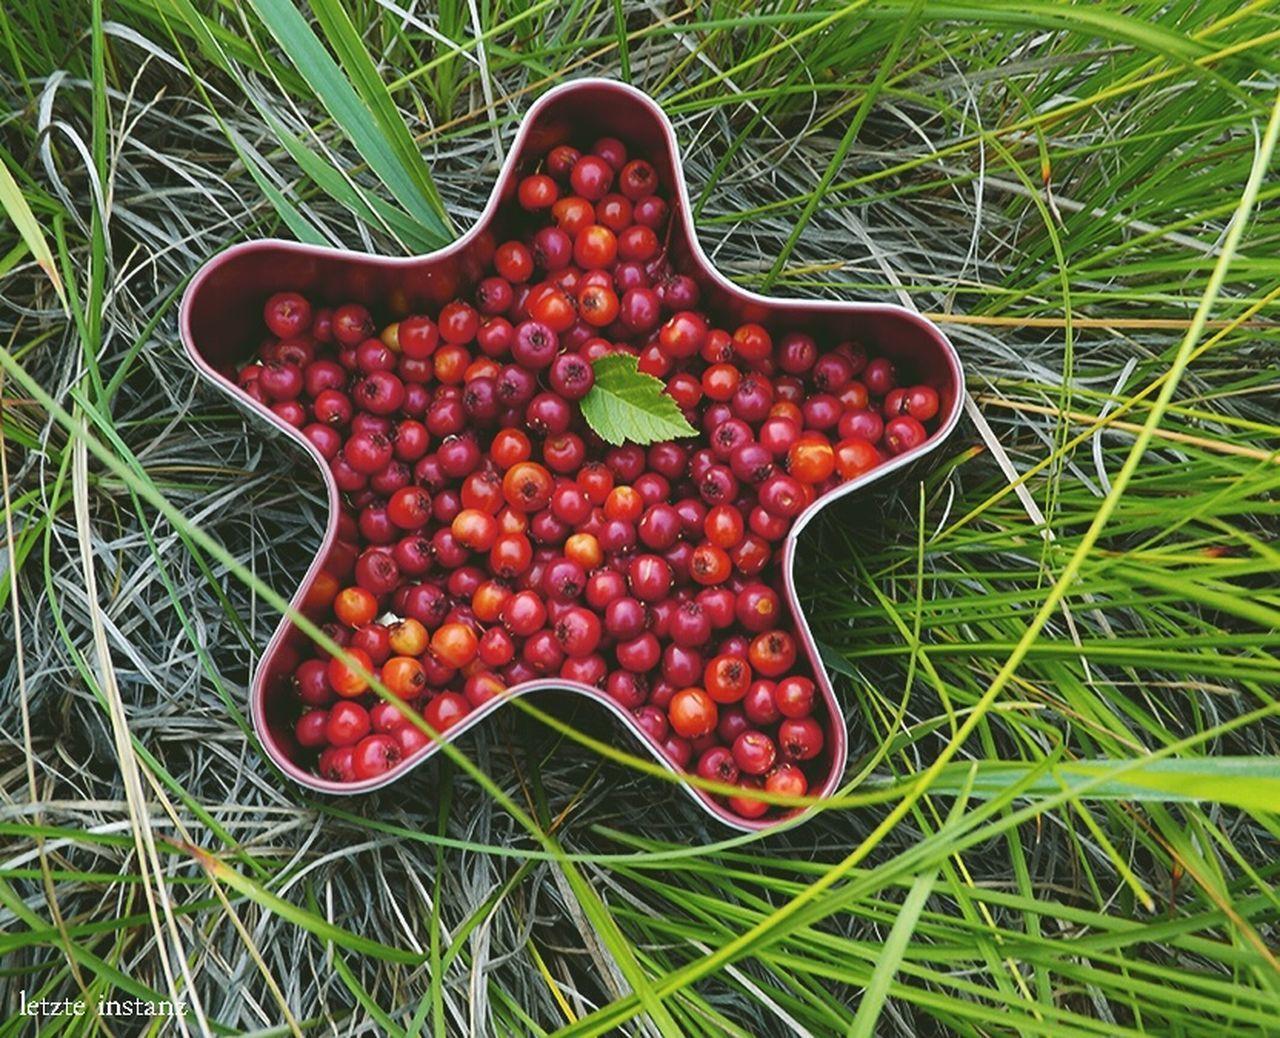 Красная звезда из августовского сбора боярышника) Grass Plants 🌱 Transbaikalia Nature Red Berry Star Wildberry Hawthorn Забайкалье